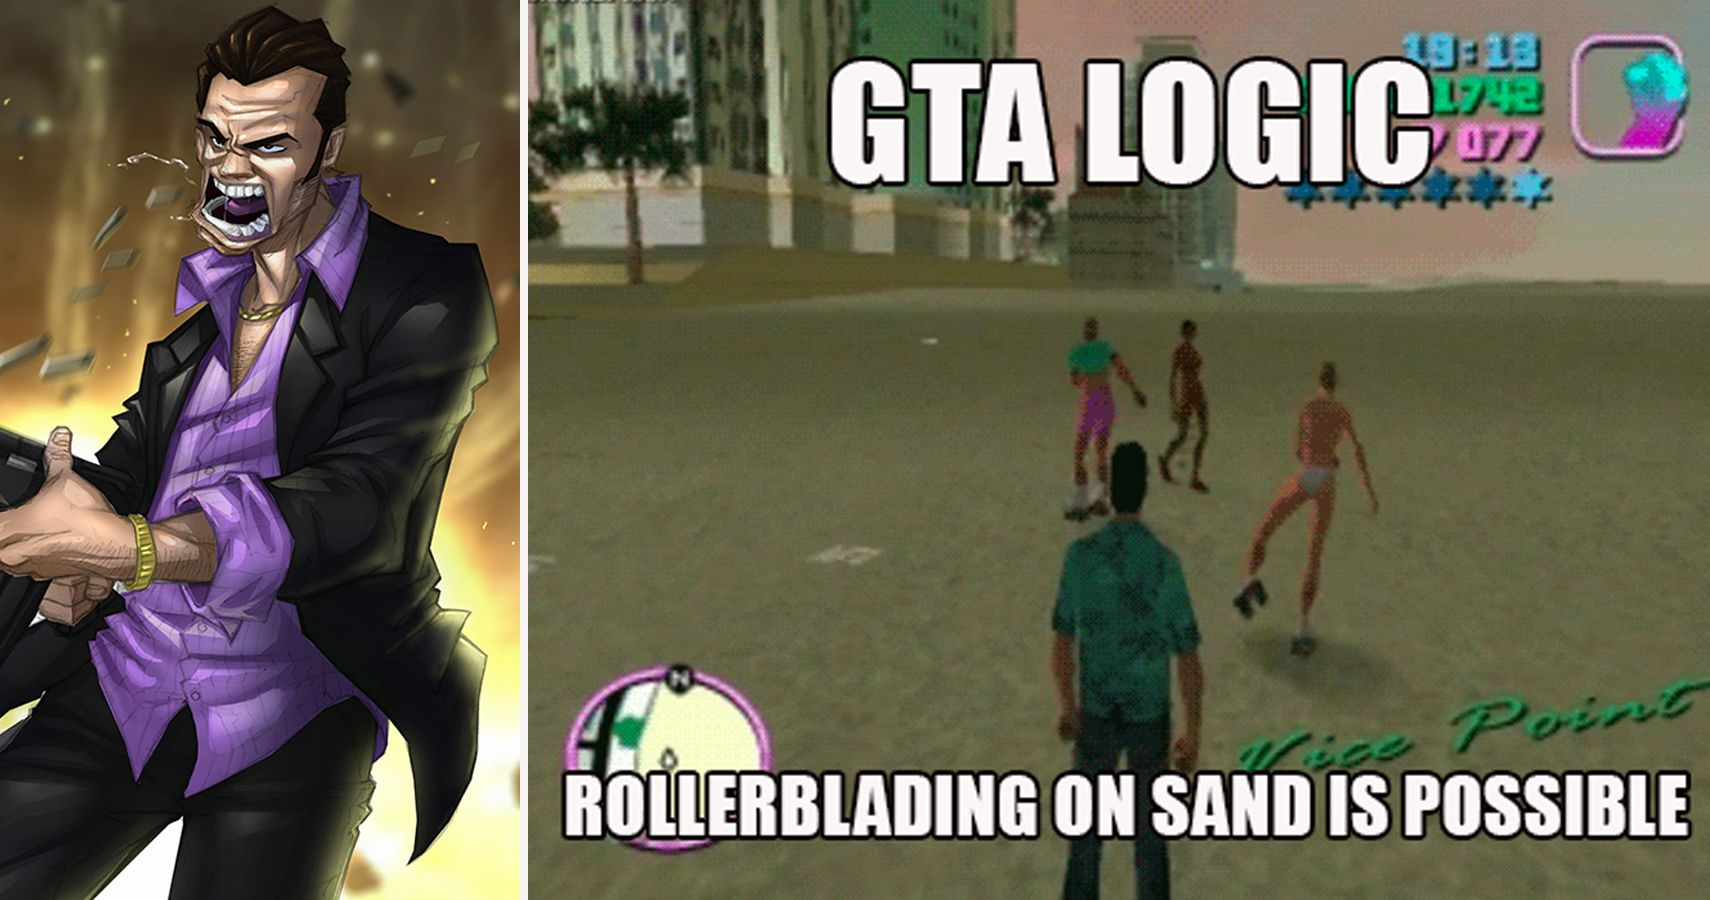 20 Hilarious Grand Theft Auto: Vice City Memes | TheGamer